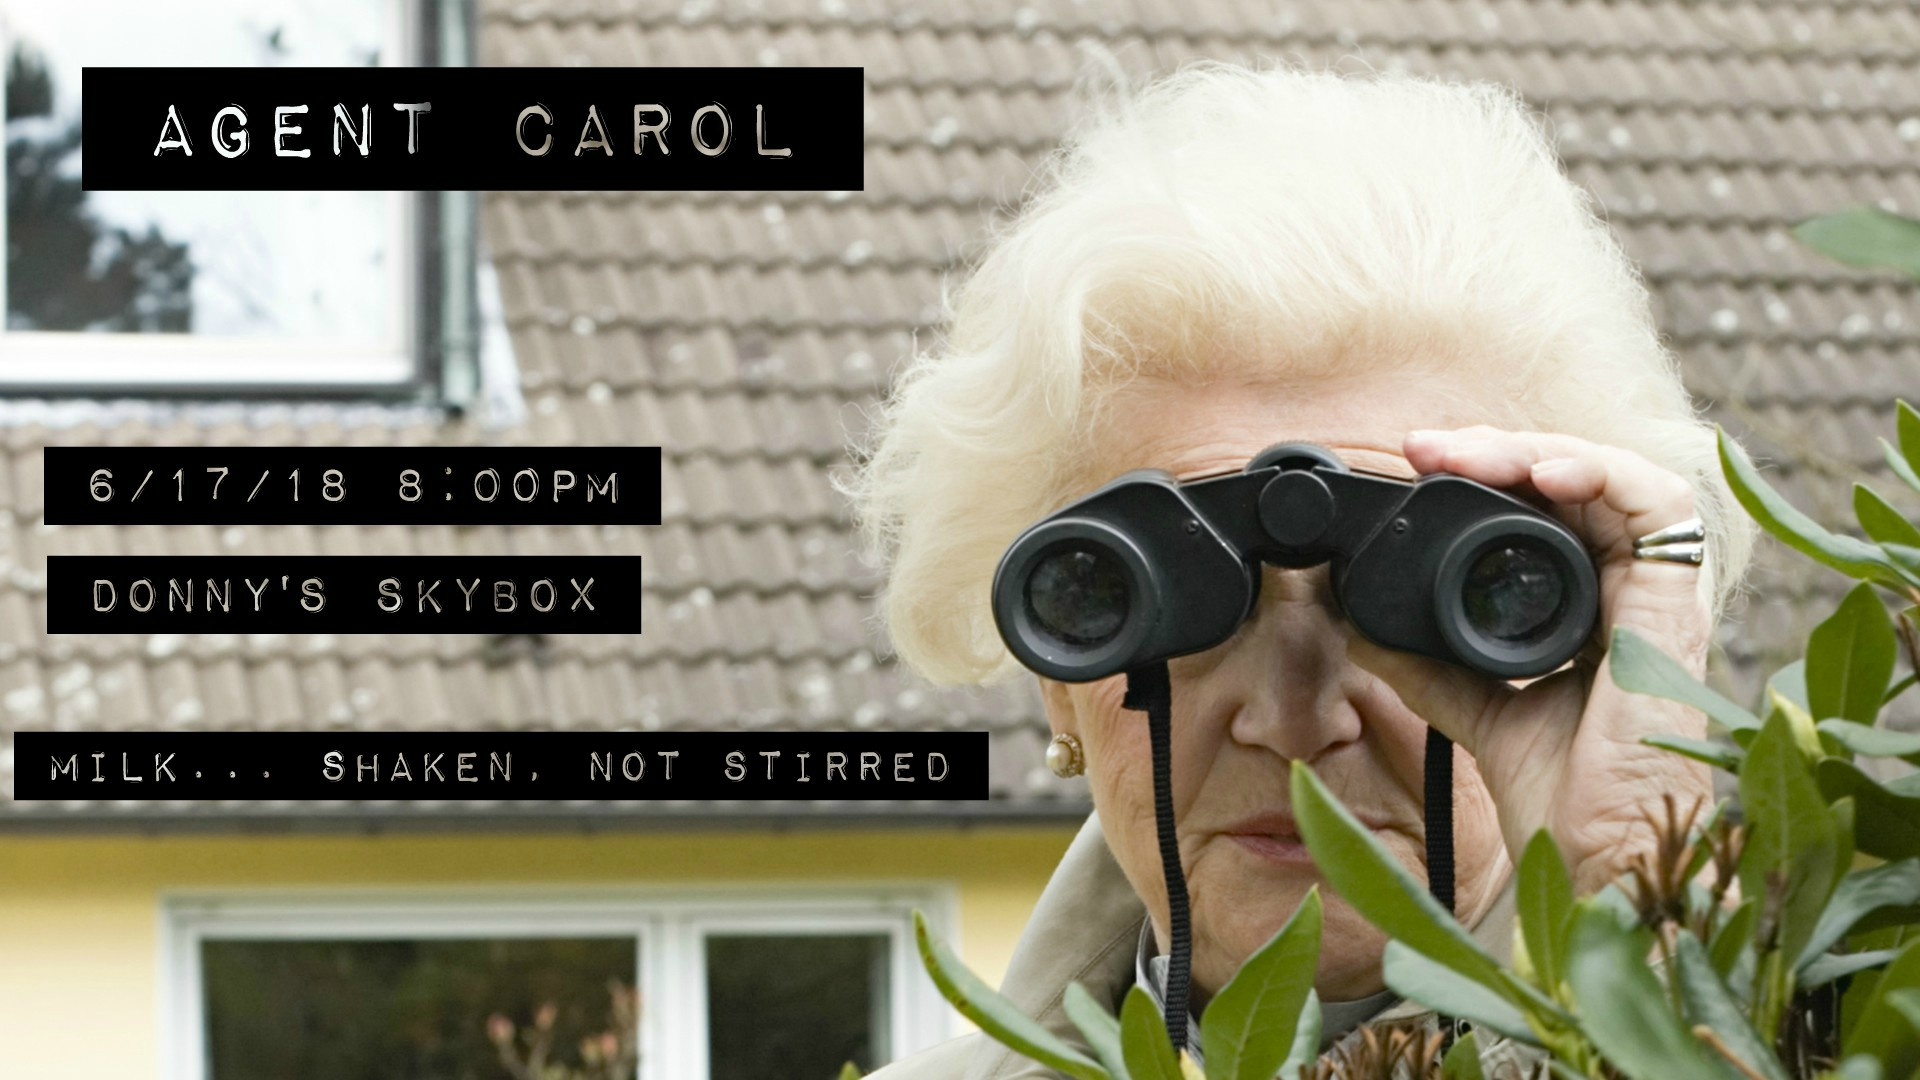 Agent Carol featuring Pegasus Vin Diesel